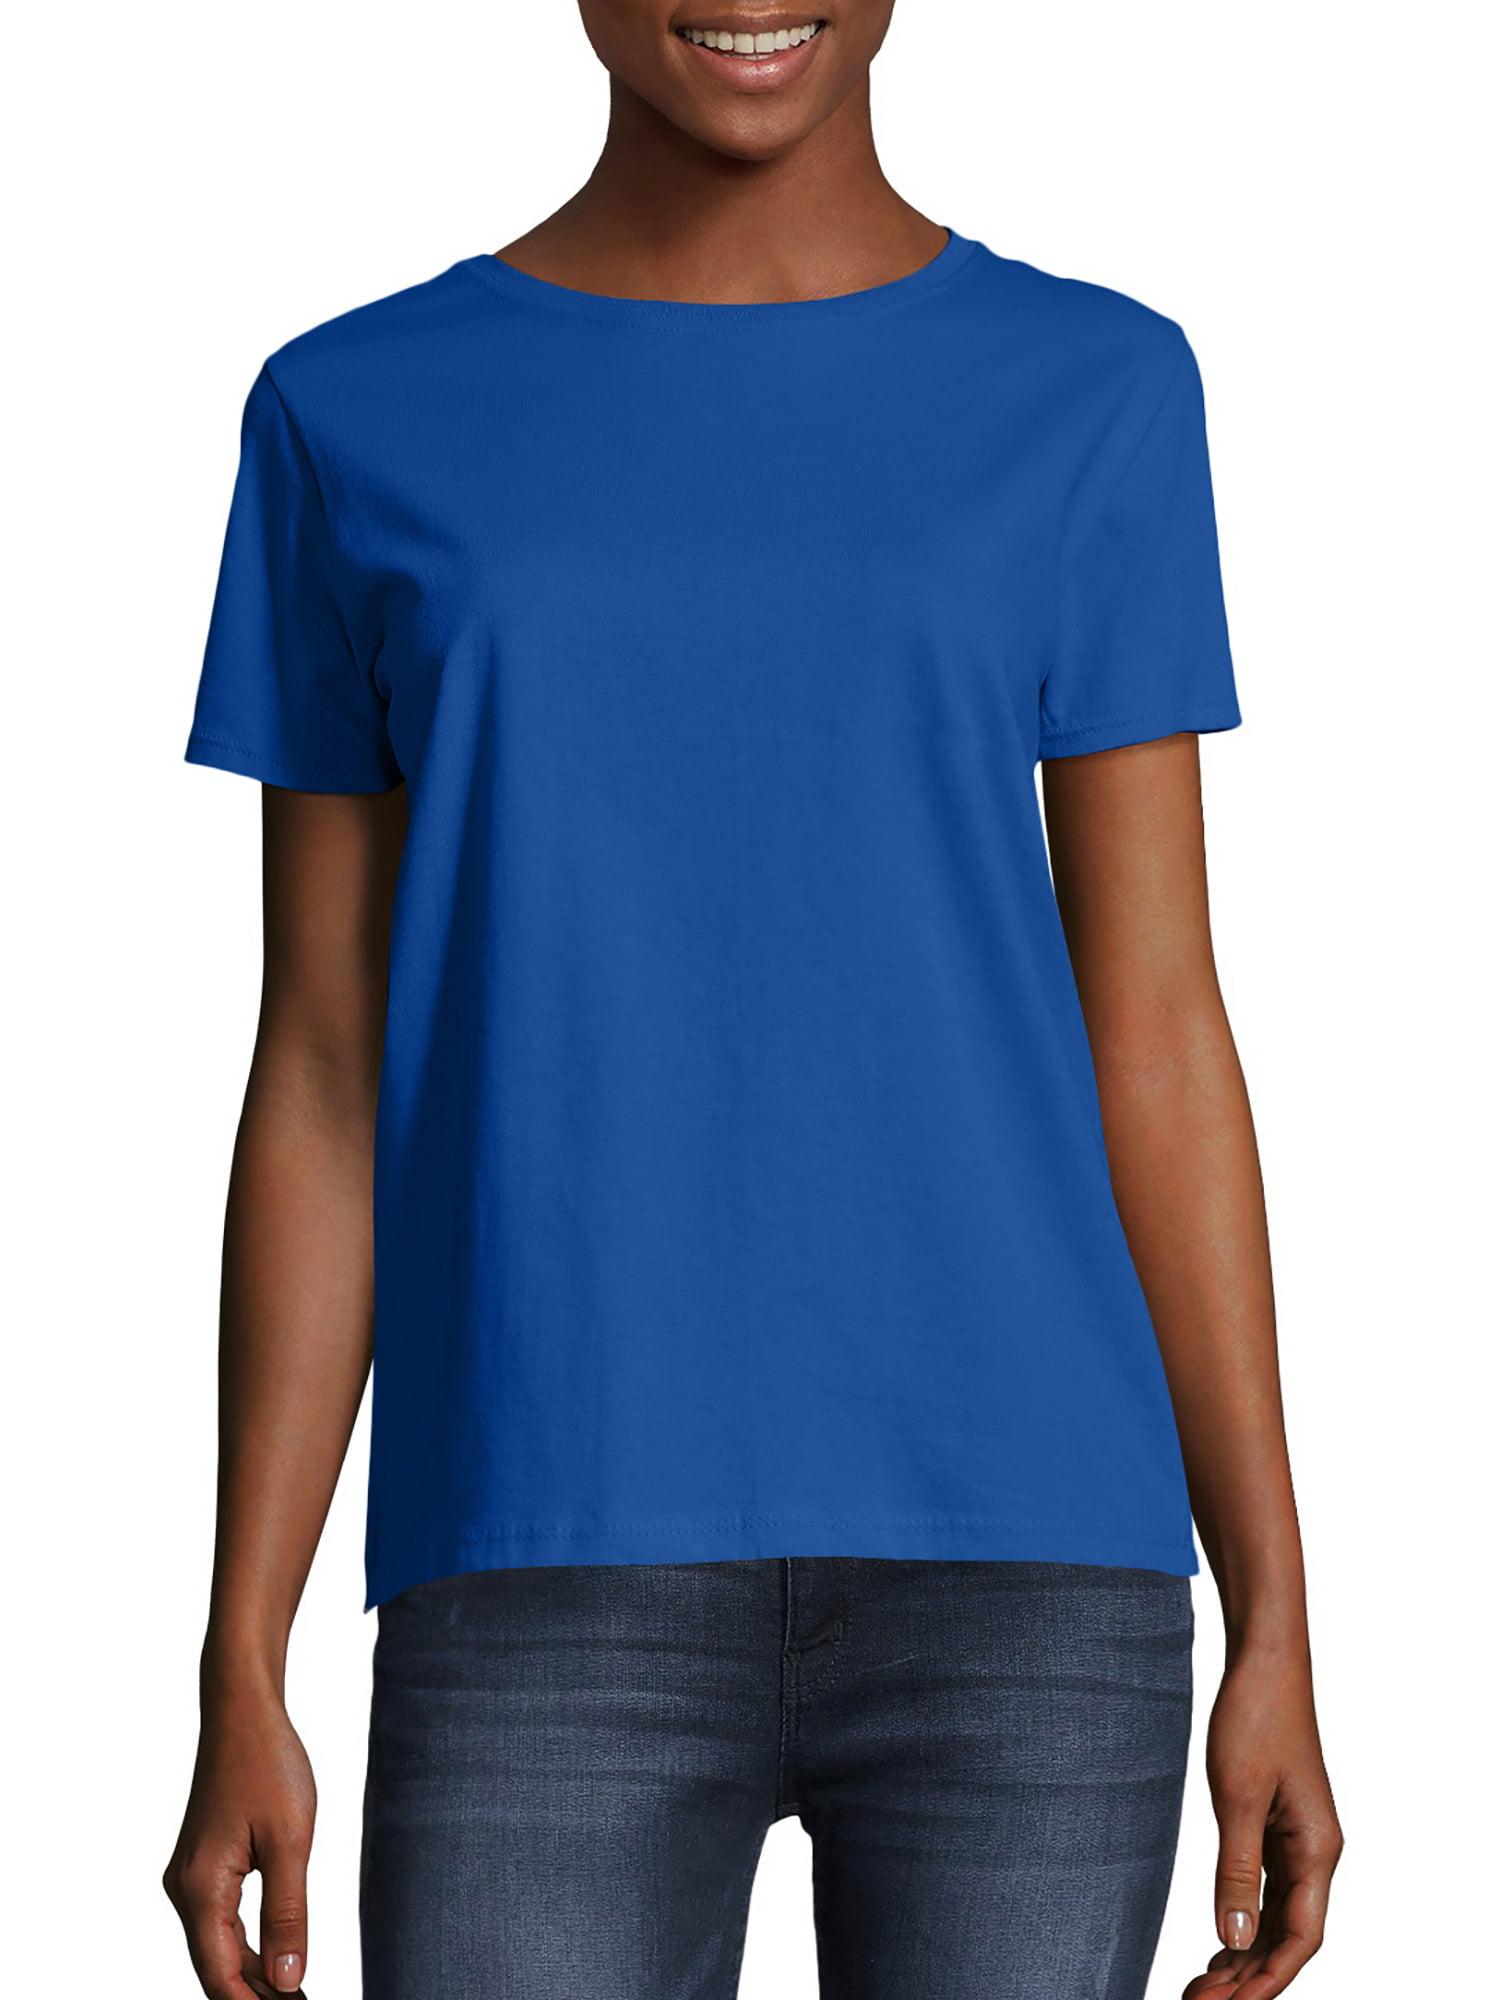 COOL BEARD Womens Clothing T Shirts Slim-Fit Plain ComfortSoft